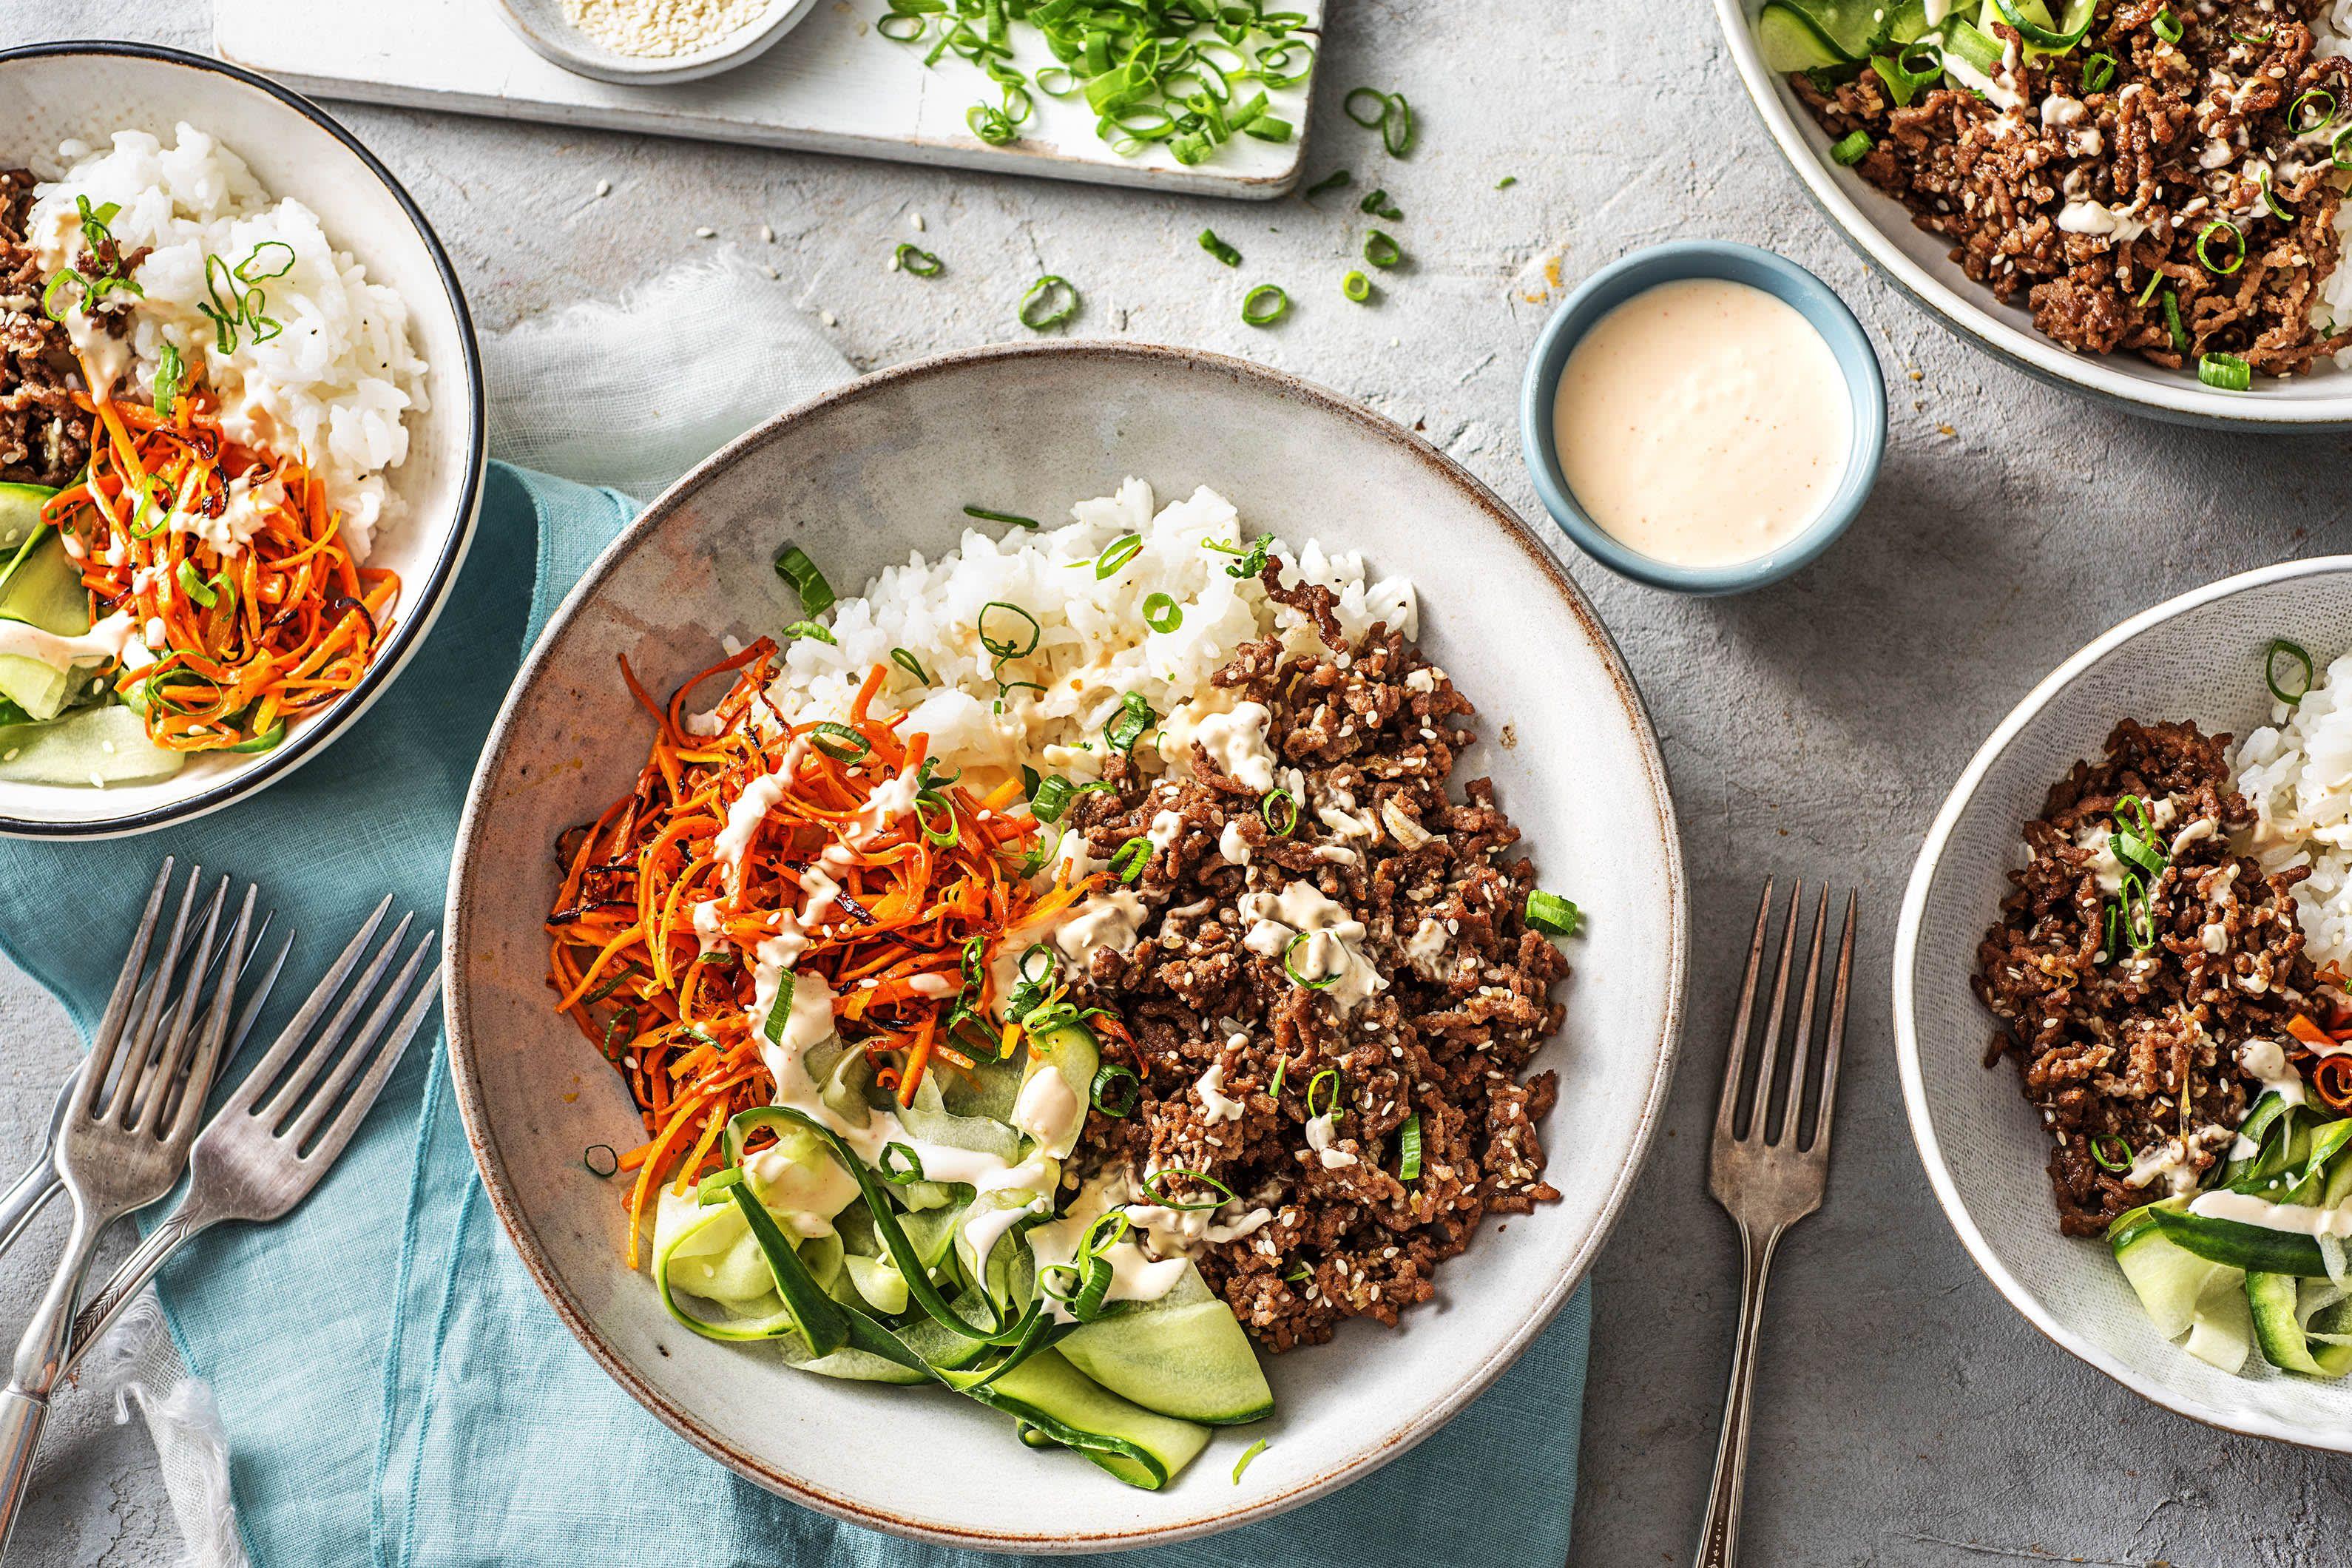 Ground Beef Bulgogi Bowls With Carrots Cucumber And Sriracha Crema Over Jasmine Rice Recipe Beef Bulgogi Recipe Bulgogi Recipe Ground Beef Bulgogi Recipe